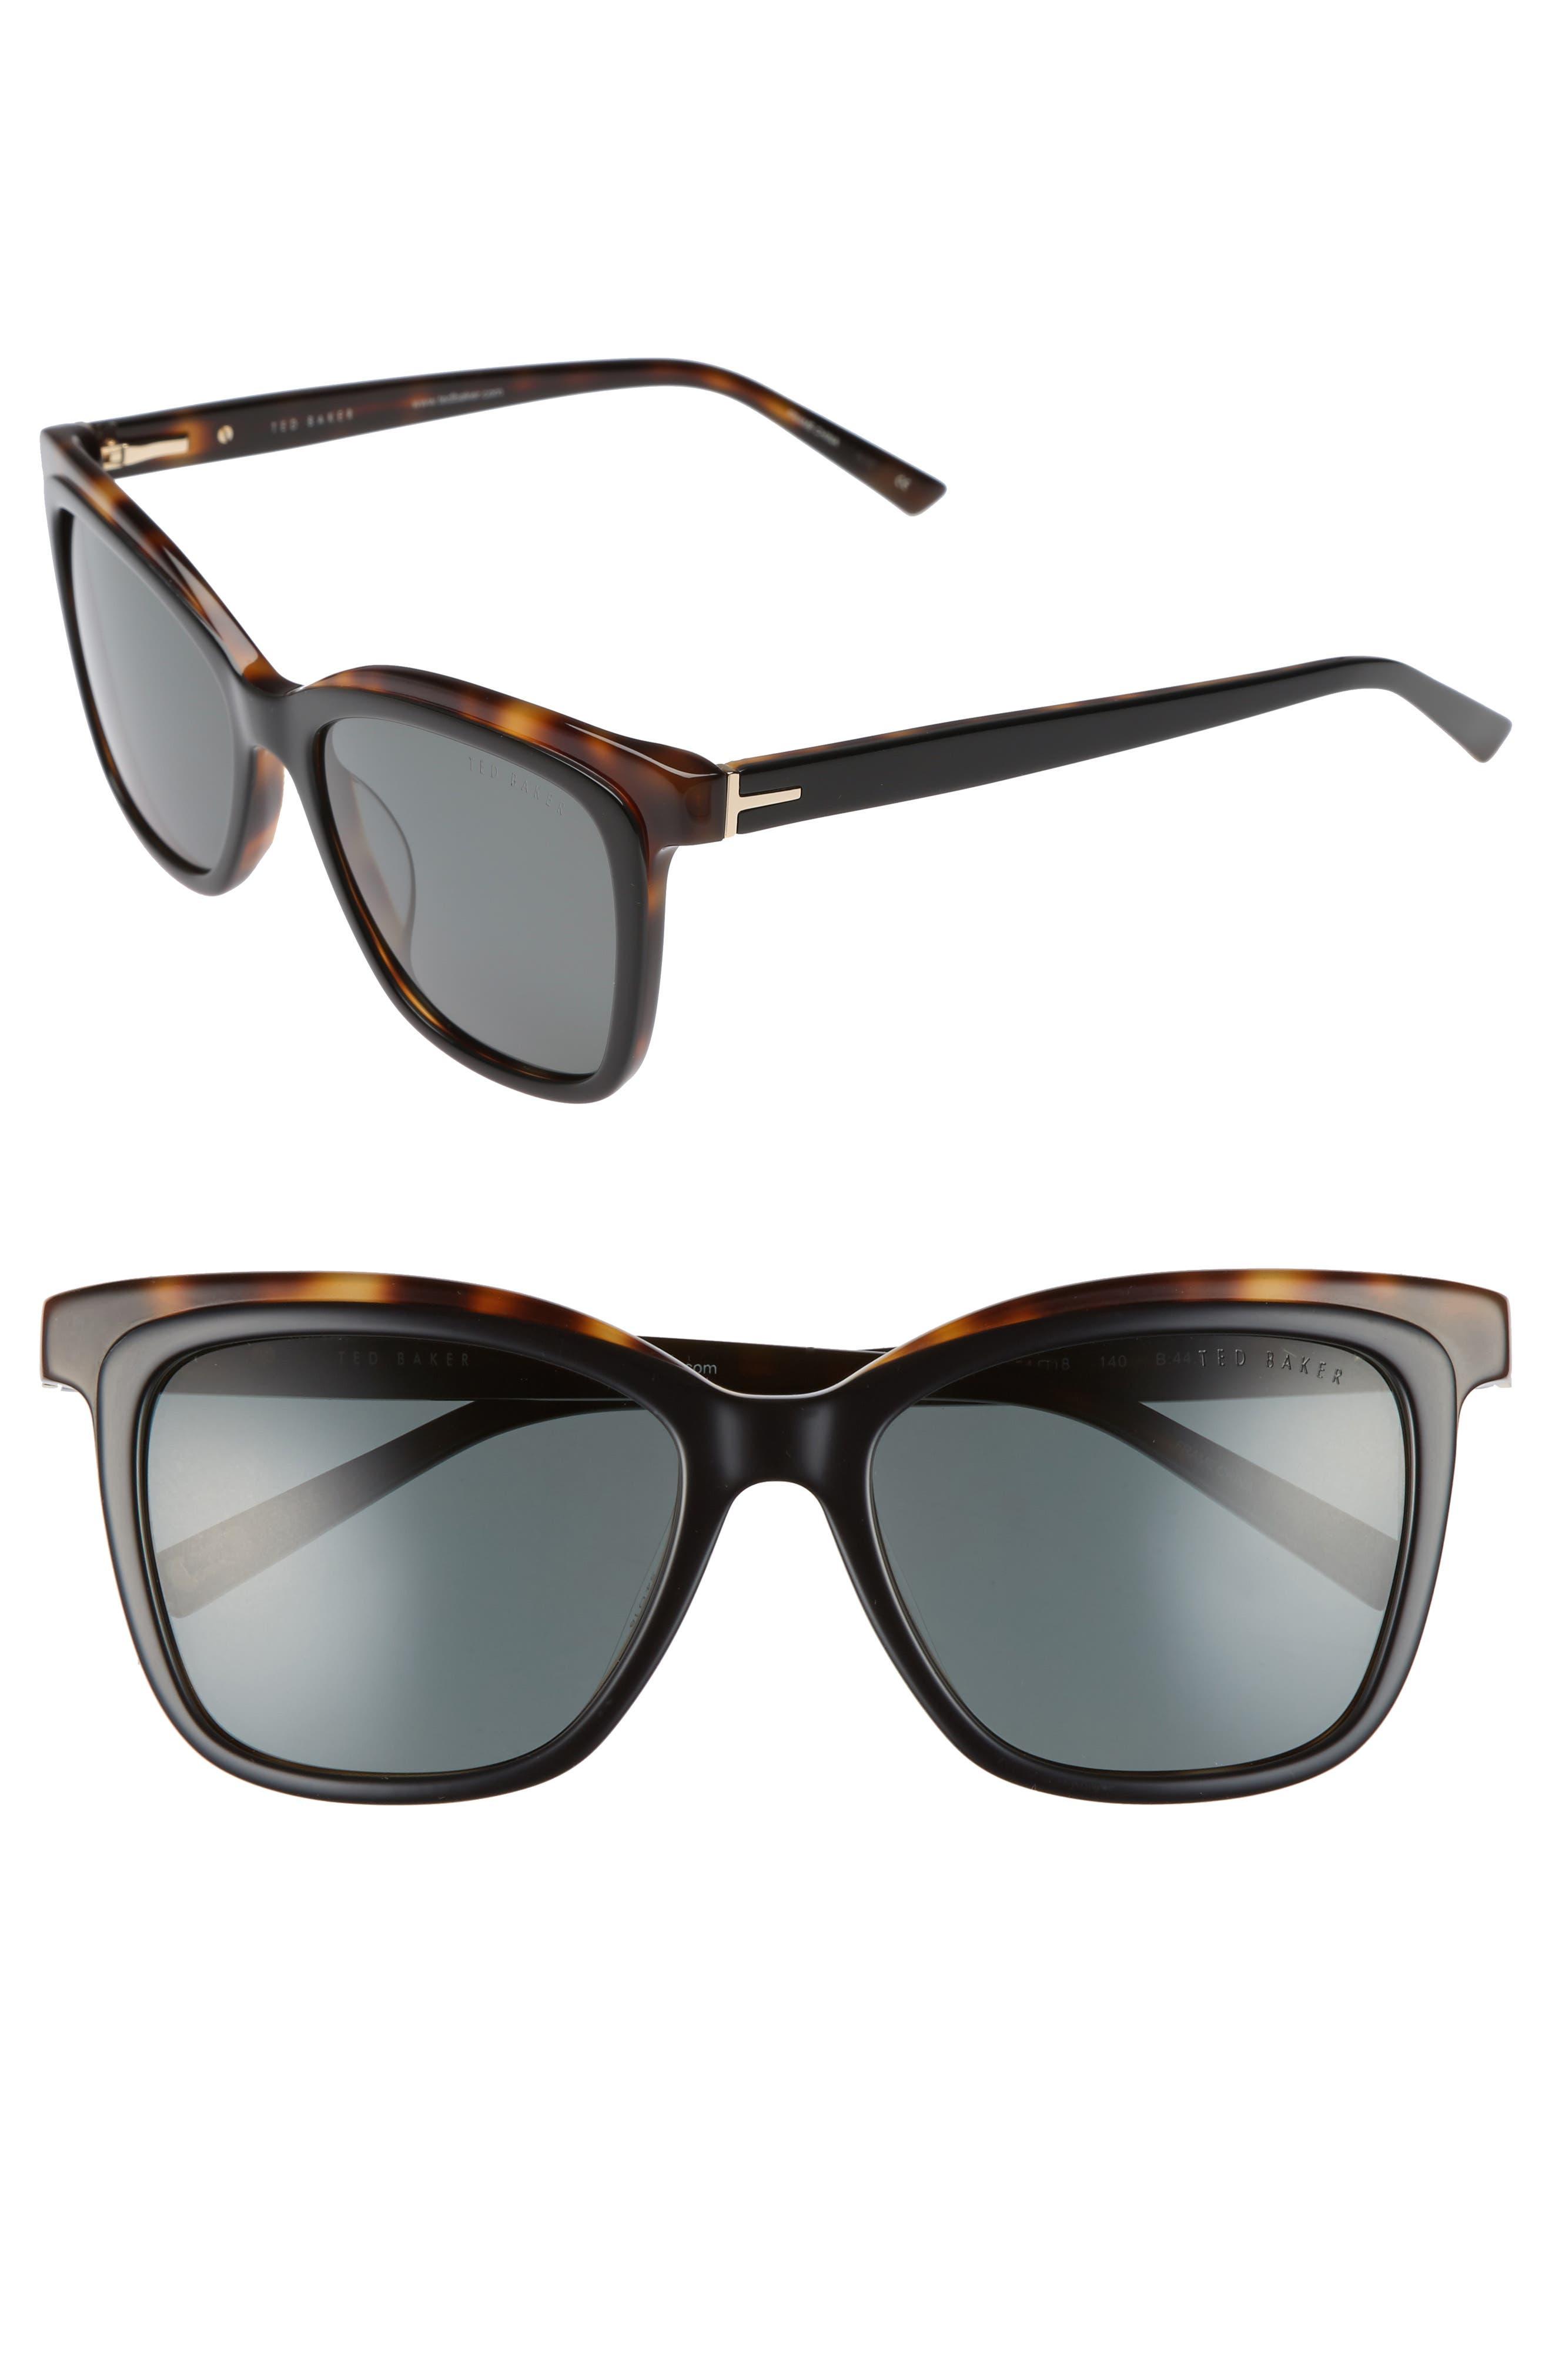 54mm Polarized Cat Eye Sunglasses,                         Main,                         color, 002